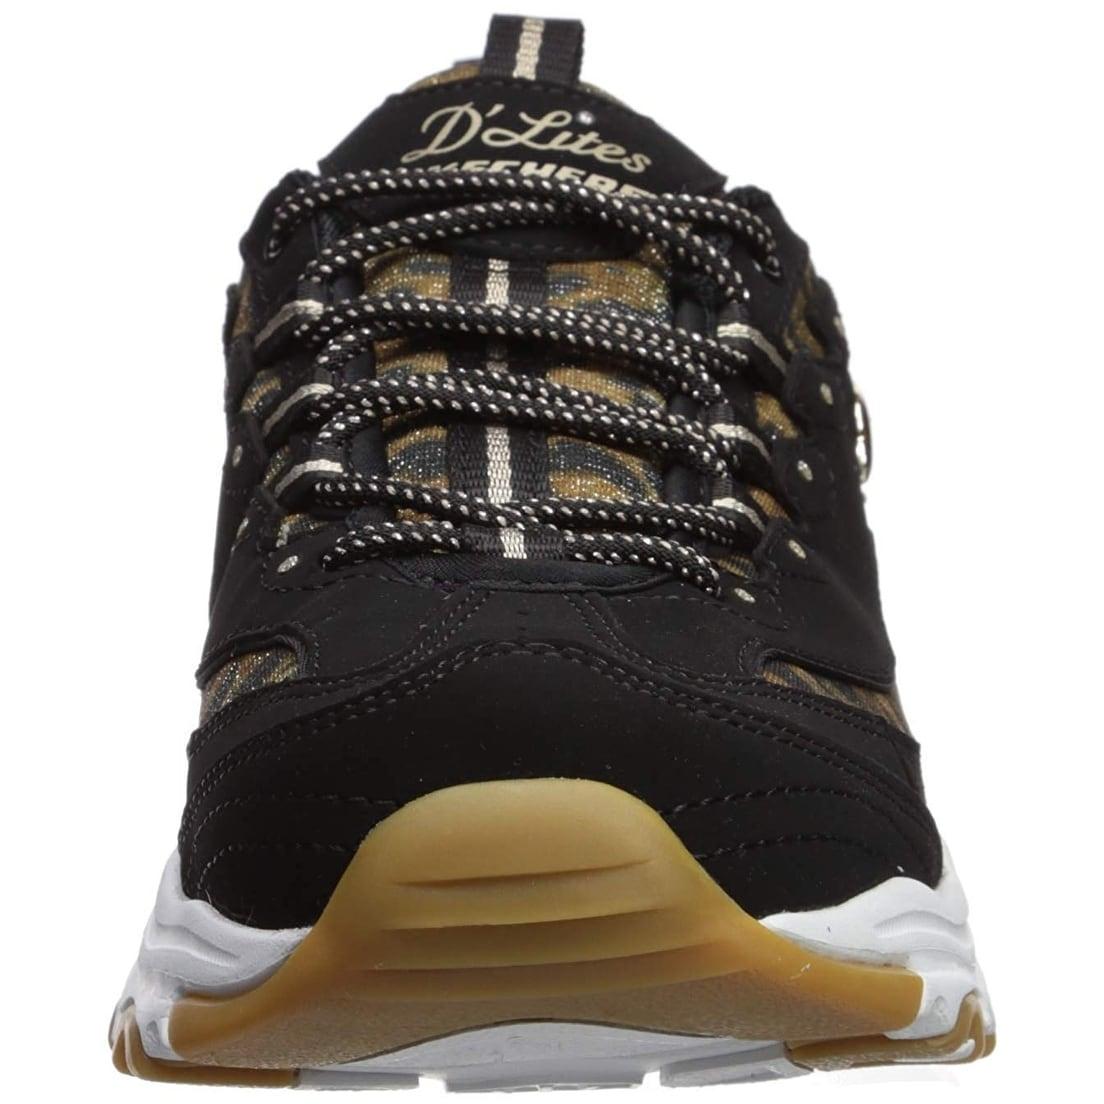 758466e1d39c Shop Skechers Women's D'Lites-Quick Leopard Sneaker - Free Shipping Today -  Overstock - 28358488